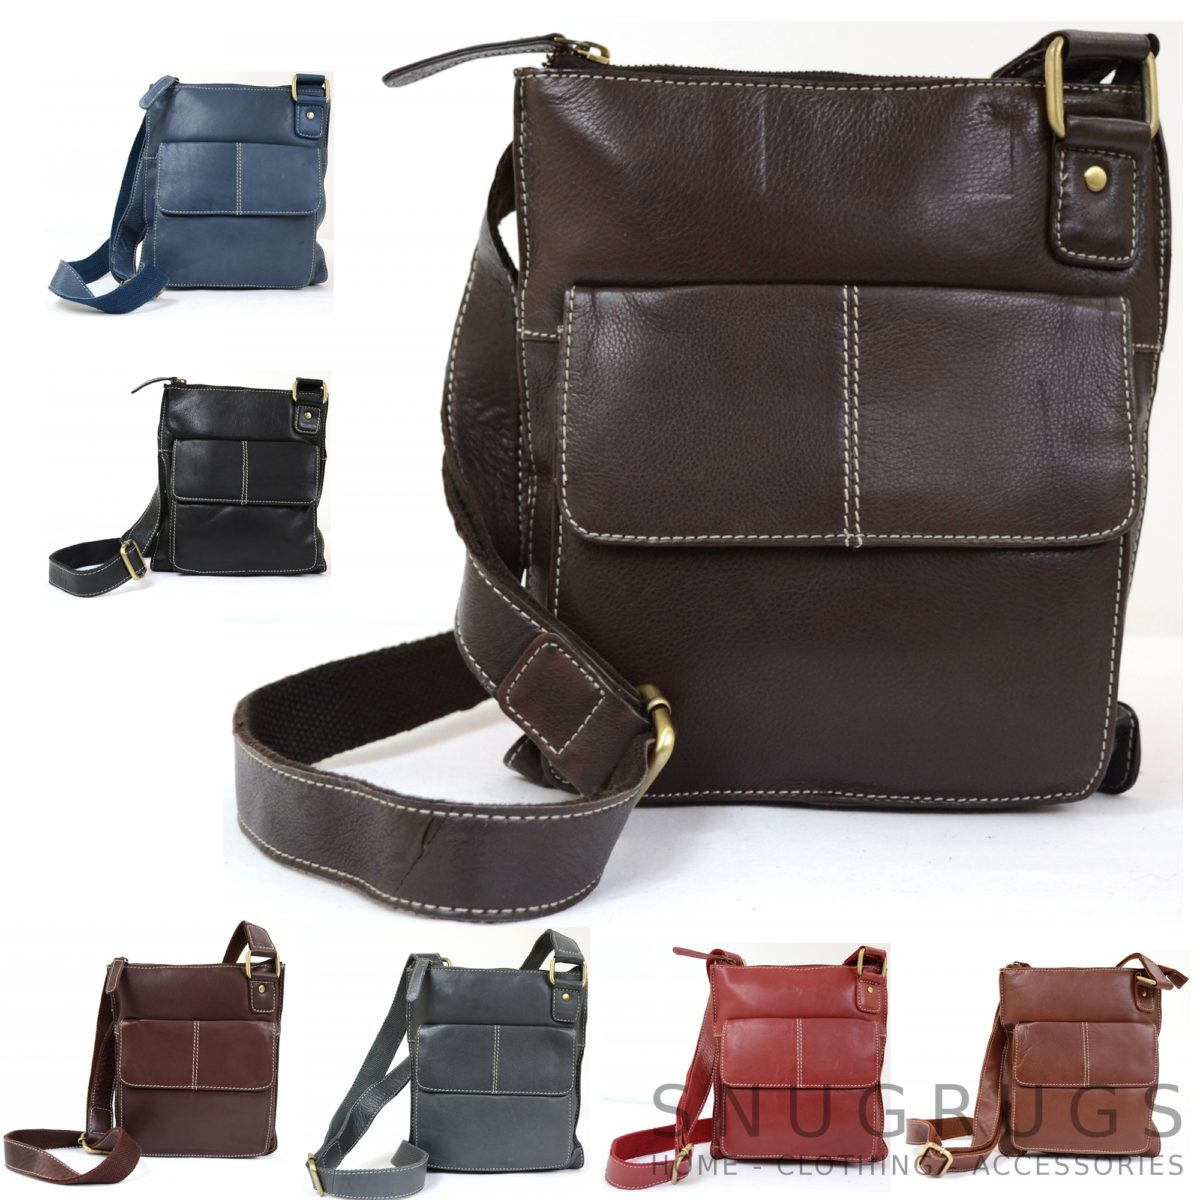 Iris – Leather Shoulder / Cross-Body Bag